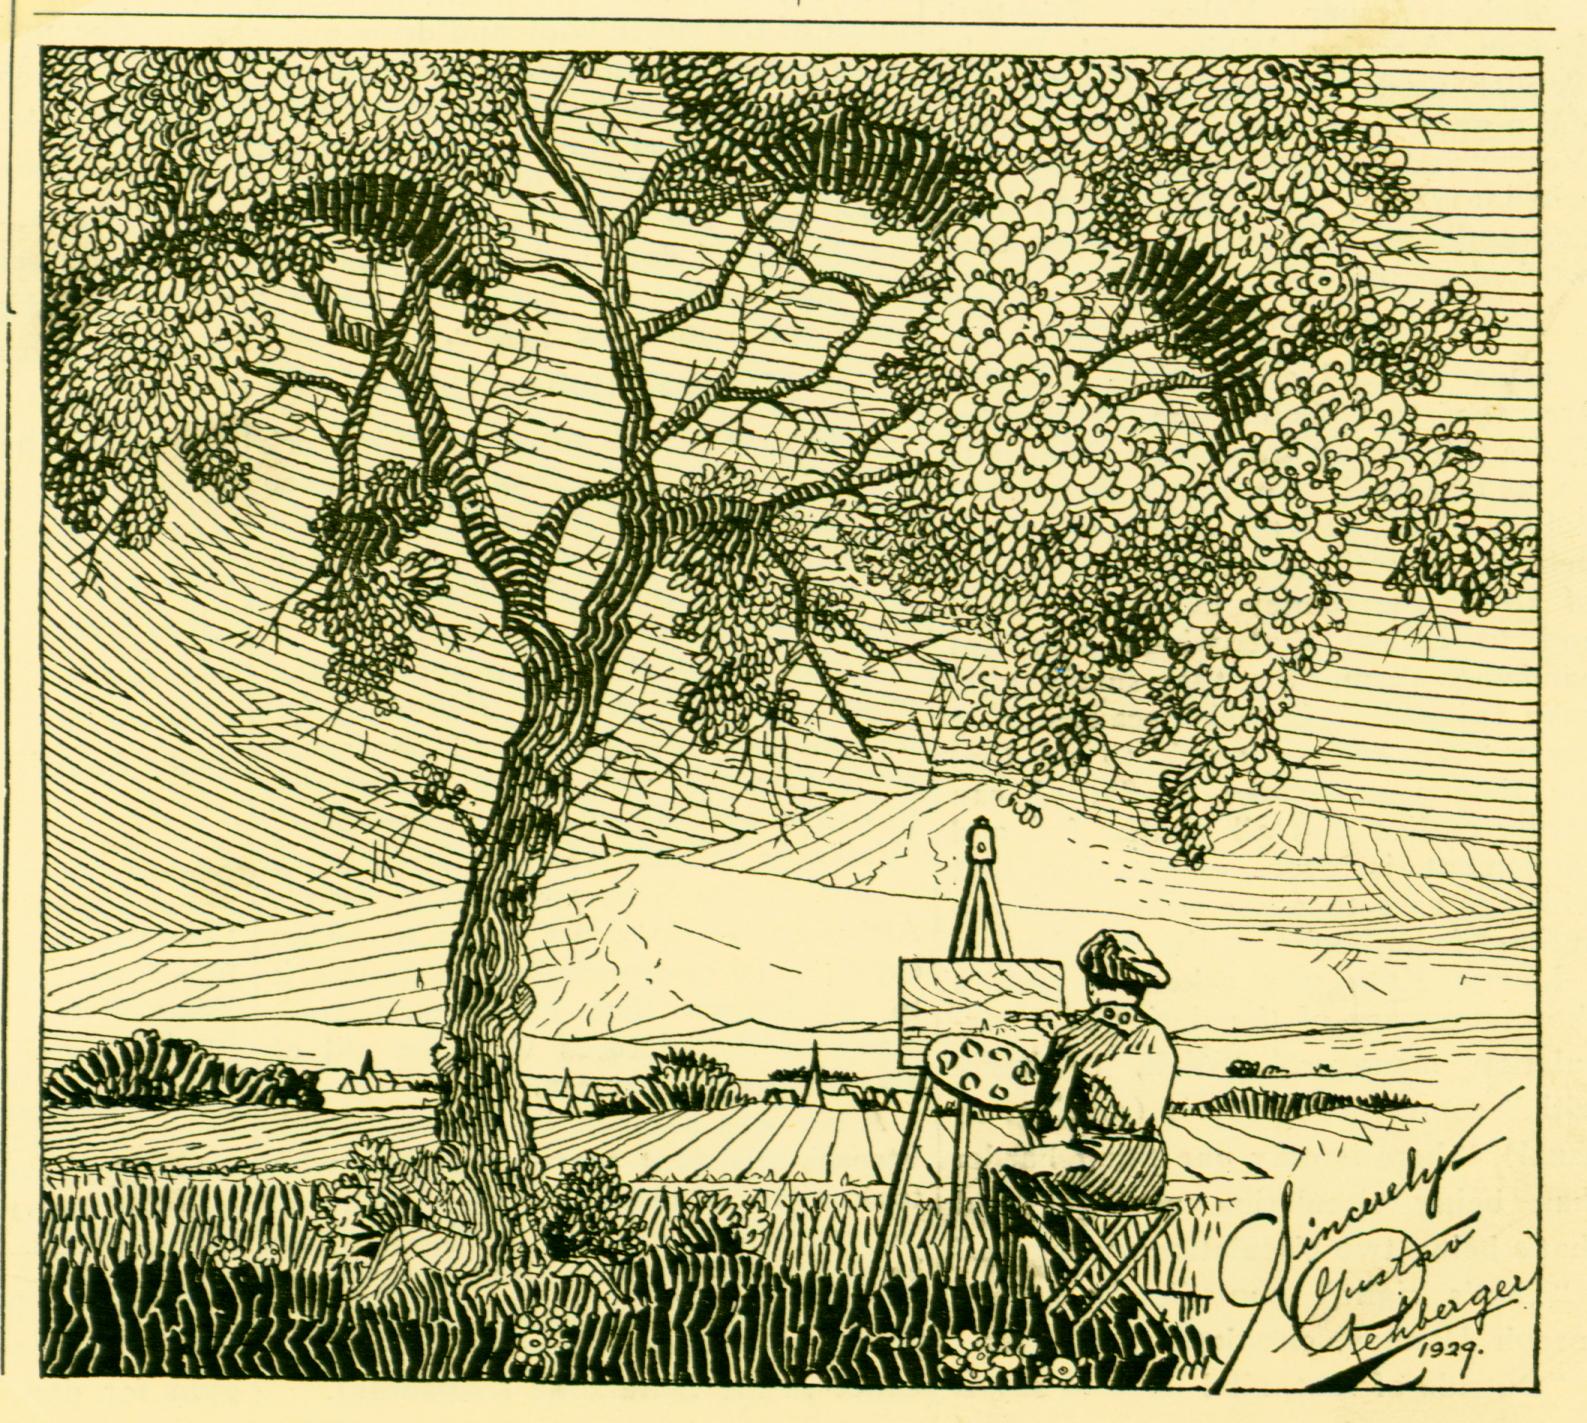 1929 - The Literary Dijest - Carl Schurz High School (Girl reading at base of tree, Pen & Ink, 7 x 6)